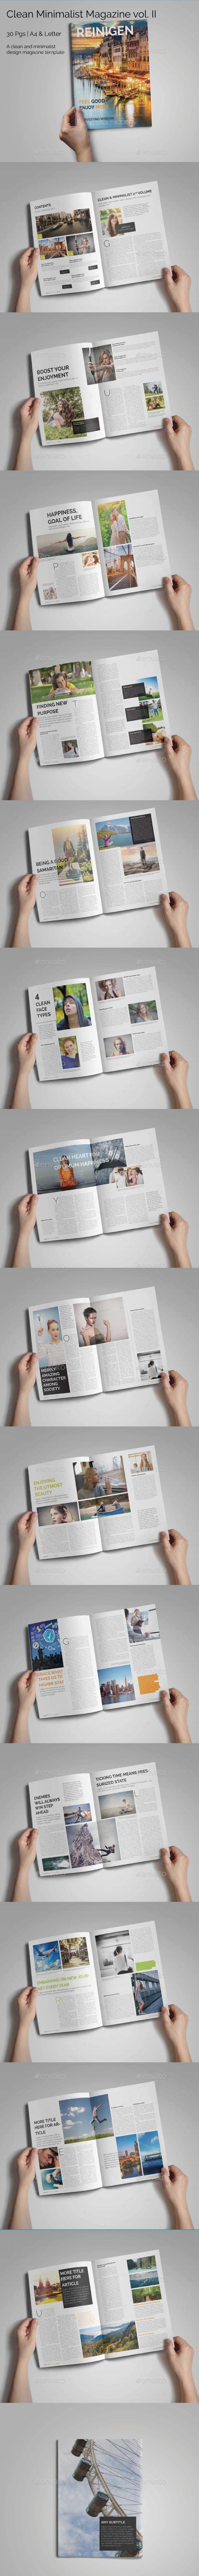 Clean Minimalist Magazine Template II - Magazines Print Templates